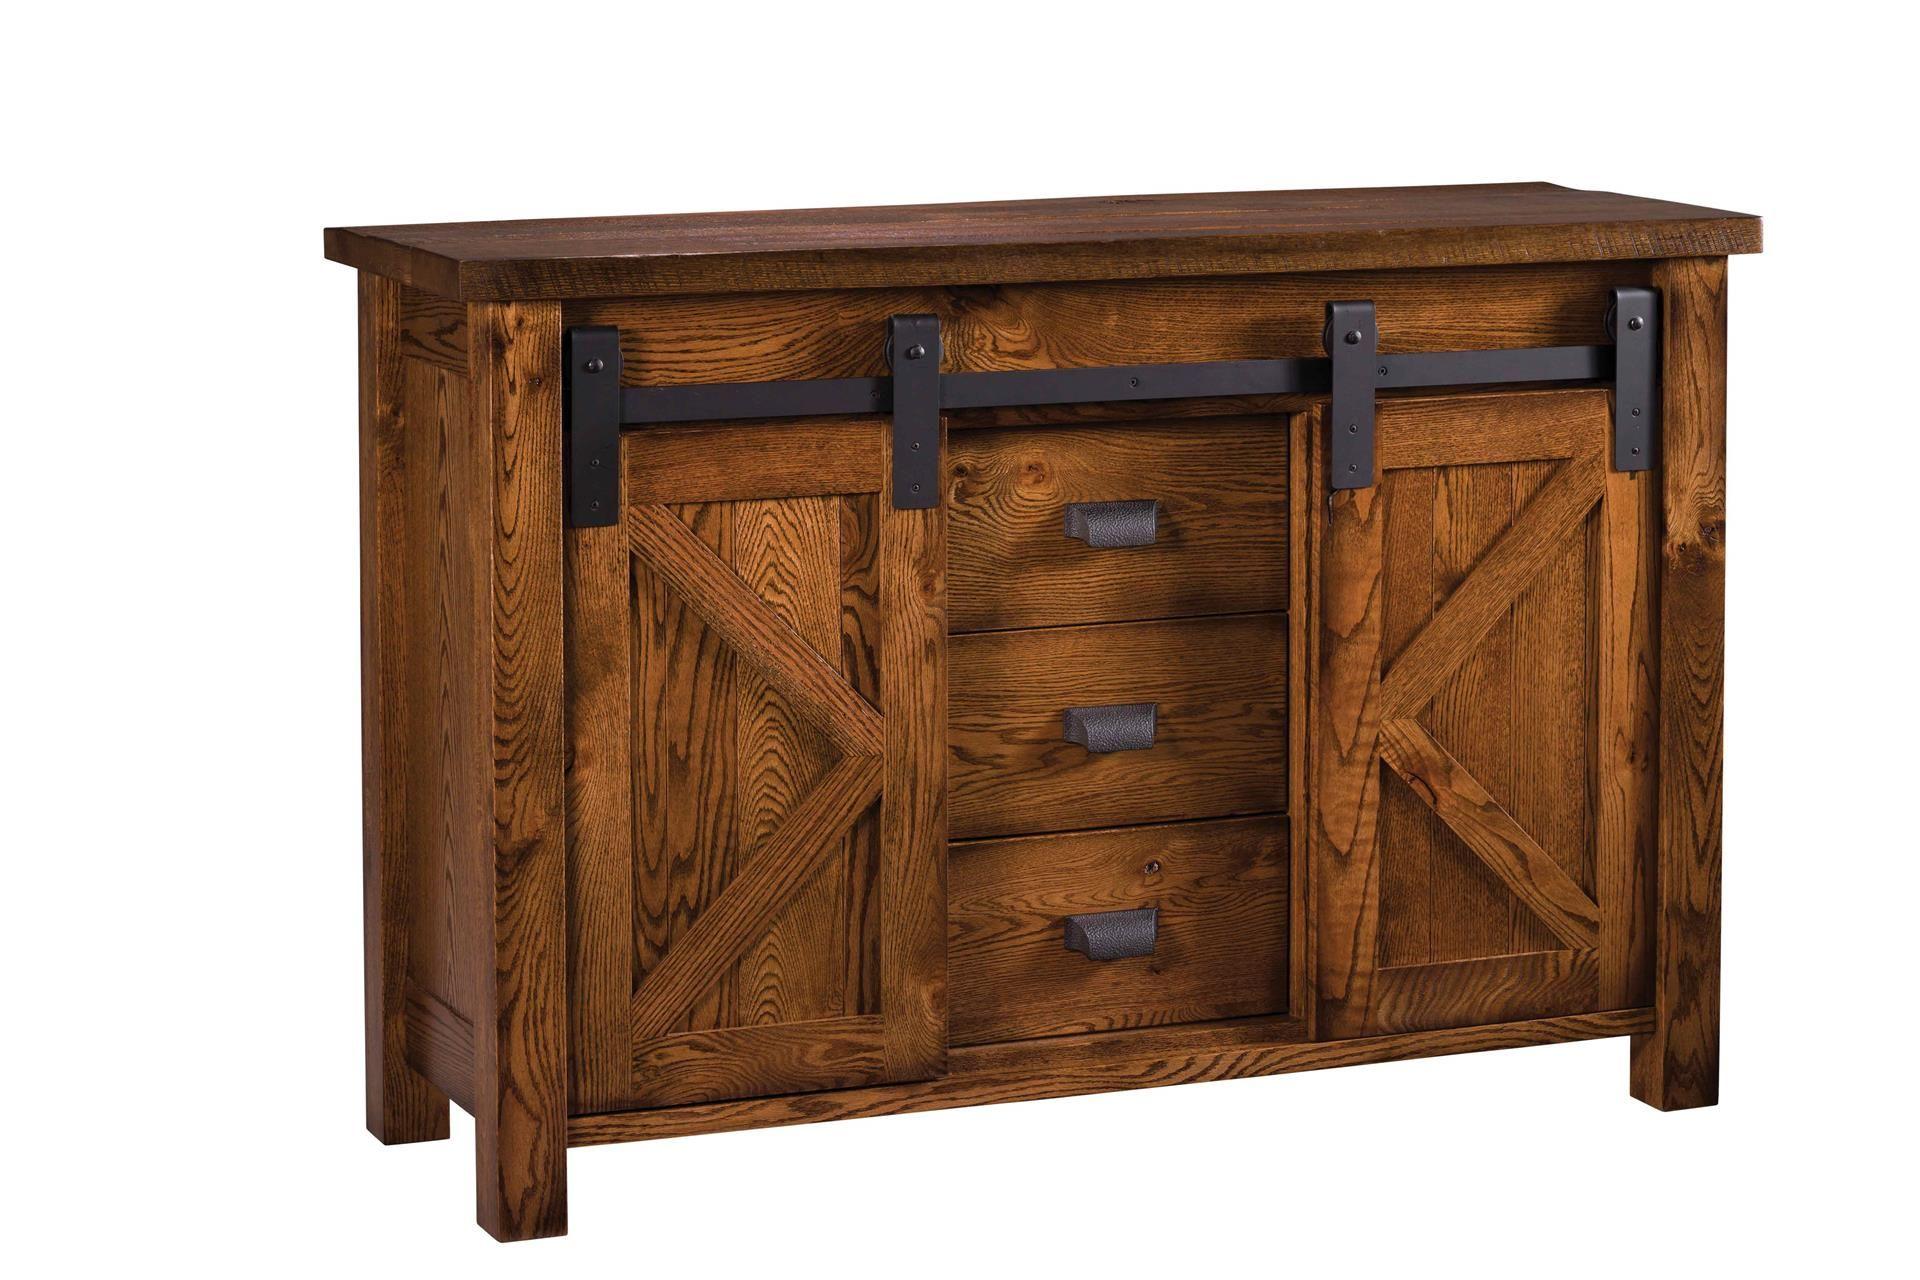 Amish Homestead Buffet Woodworking Outdoor Furniture Amish Furniture Industrial Style Furniture